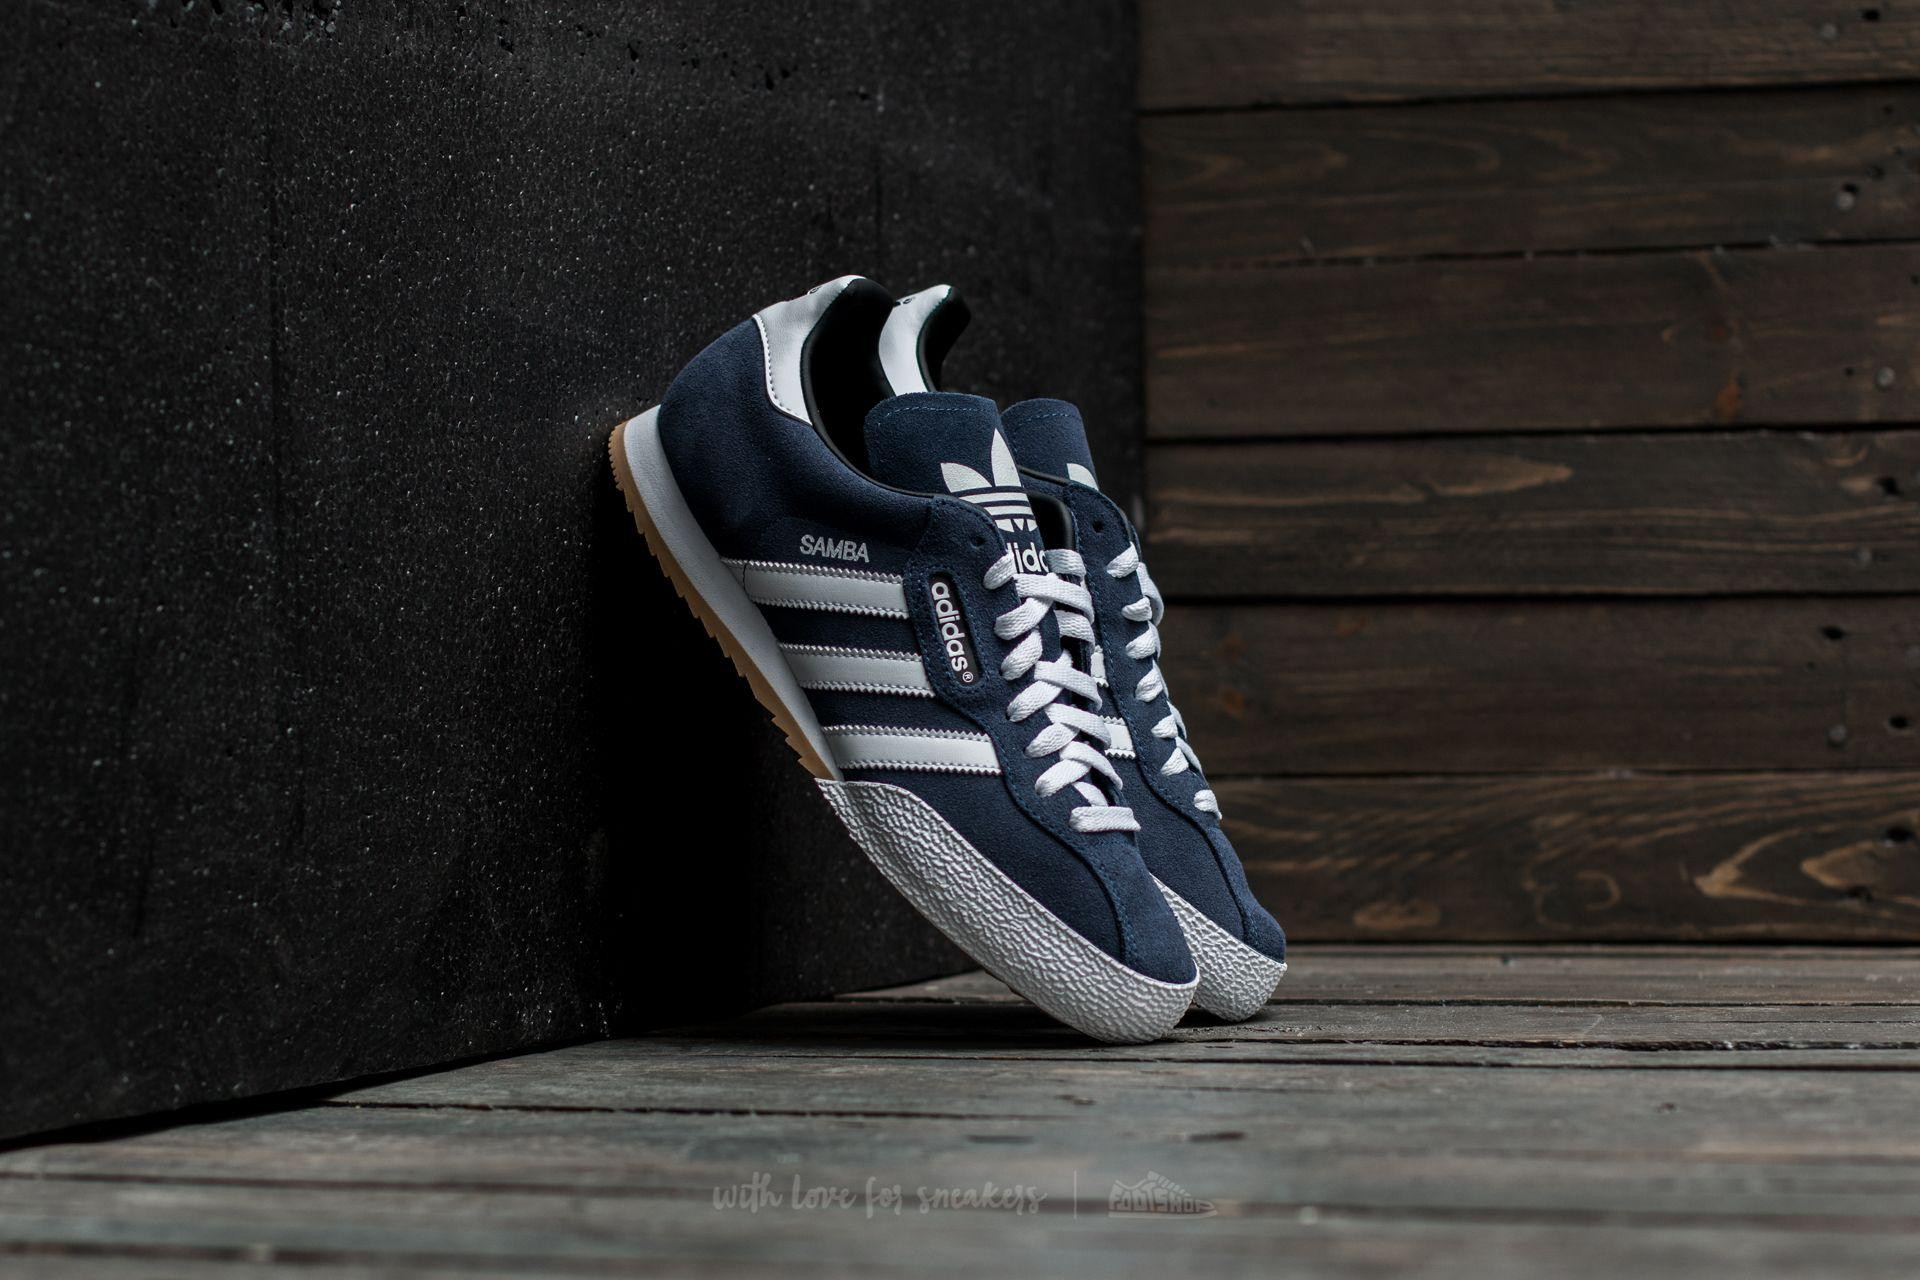 Adidas Samba Super Suede Navy/ Footwear White